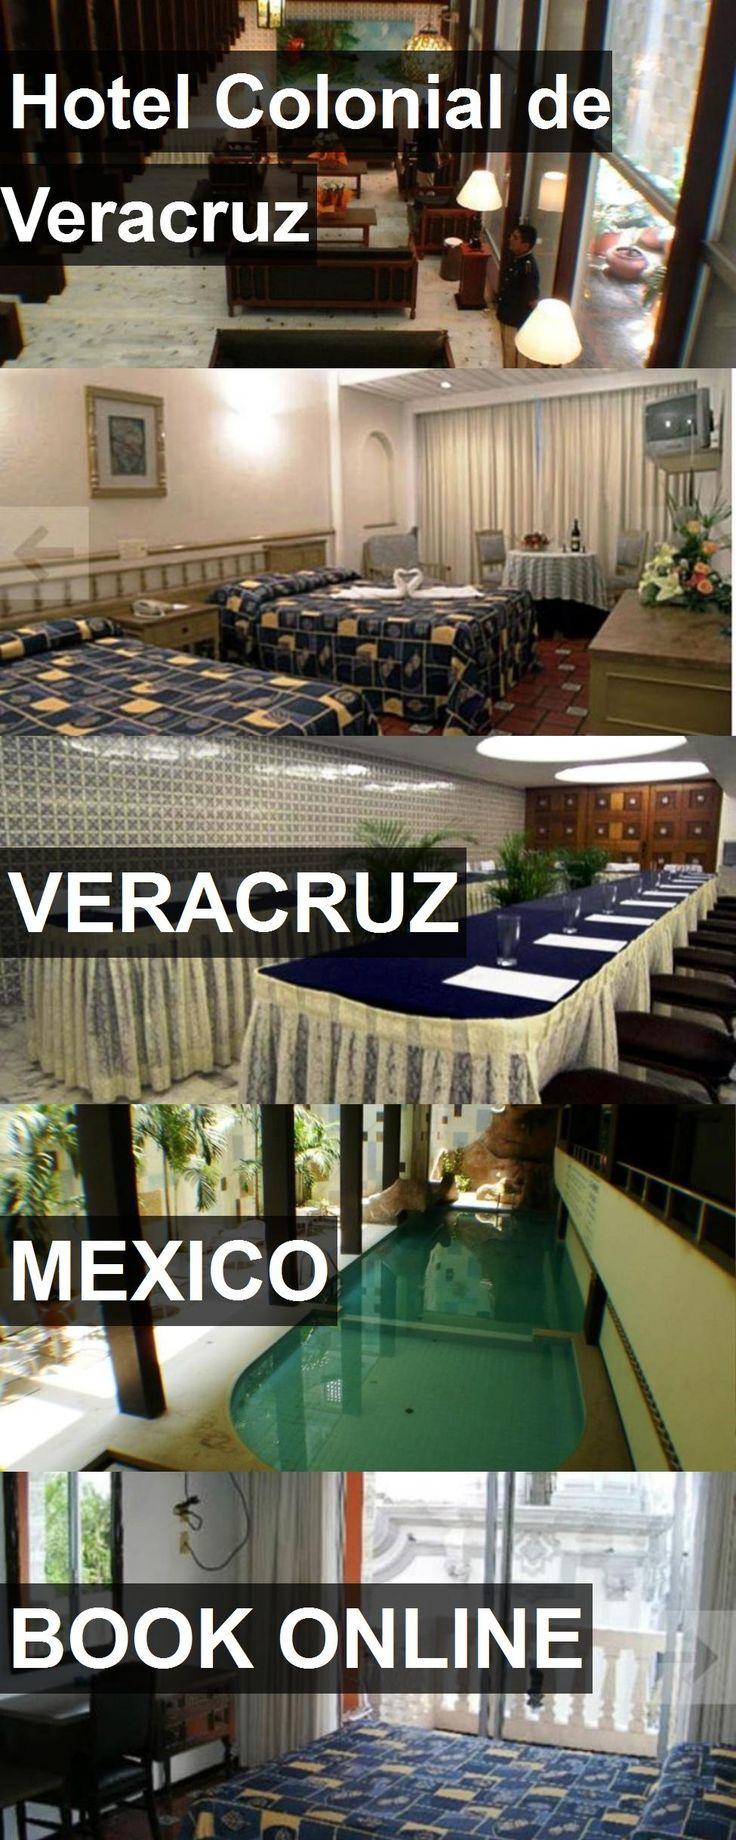 Hotel Colonial de Veracruz in Veracruz, Mexico. For more information, photos, reviews and best prices please follow the link. #Mexico #Veracruz #travel #vacation #hotel